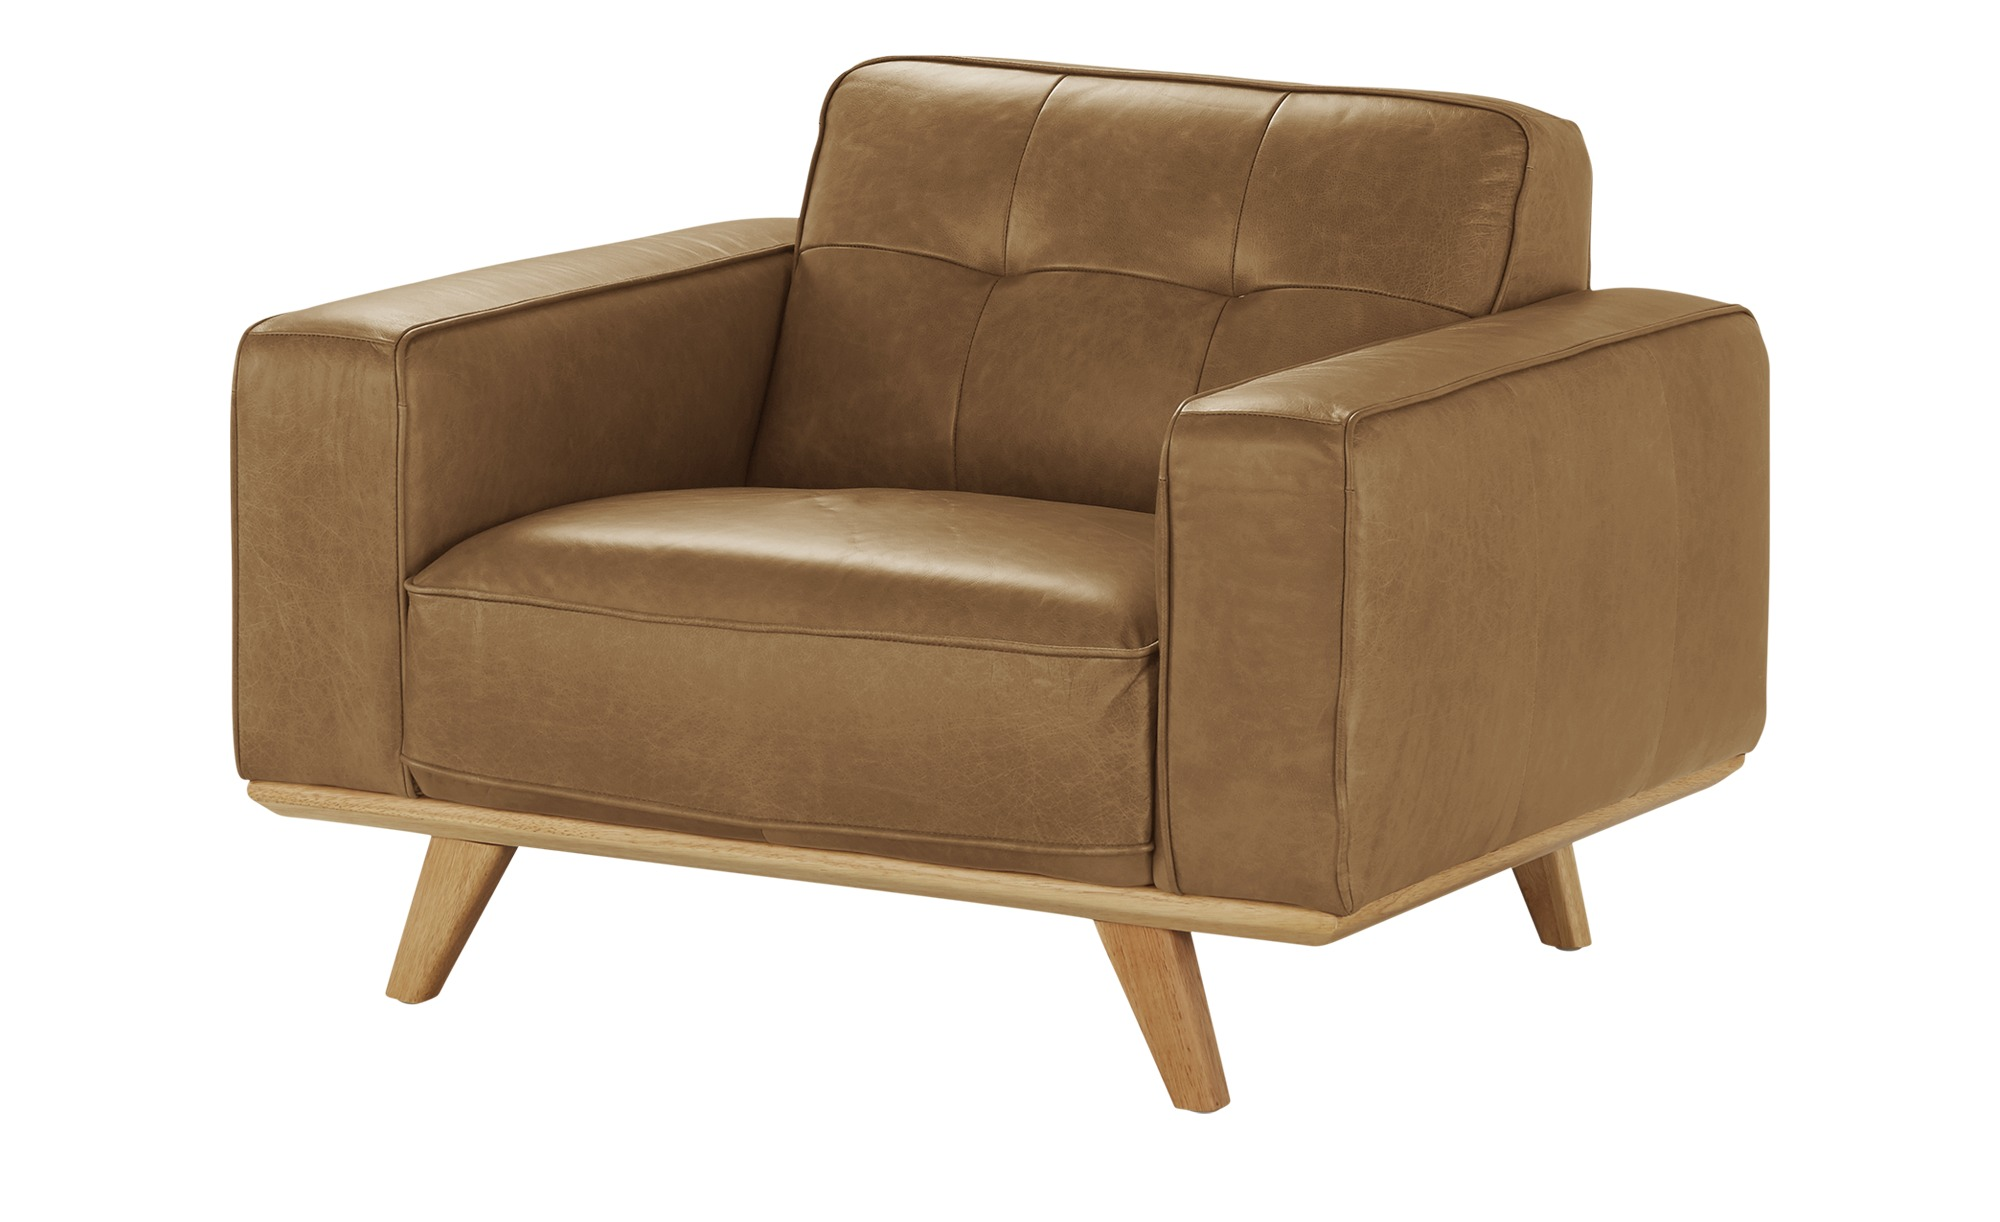 uno Leder Sessel  Caralina ¦ braun ¦ Maße (cm): B: 112 H: 78 T: 95 Polstermöbel > Sessel > Ledersessel - Höffner